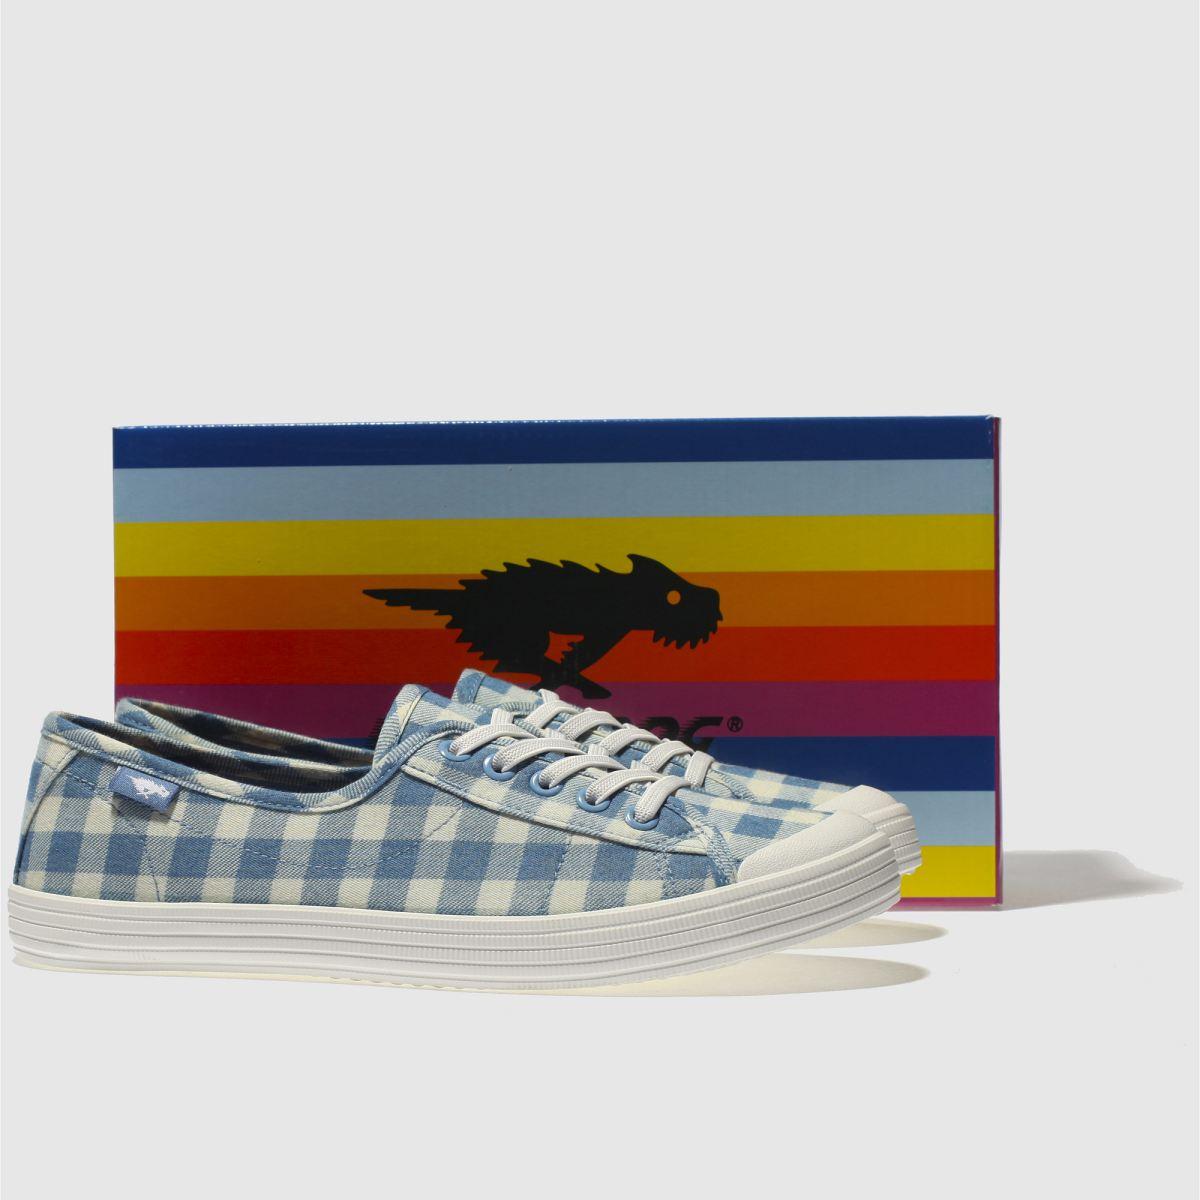 Damen Weiß-hellblau rocket dog Chow Gute Chow Sneaker | schuh Gute Chow Qualität beliebte Schuhe 1c9ddb